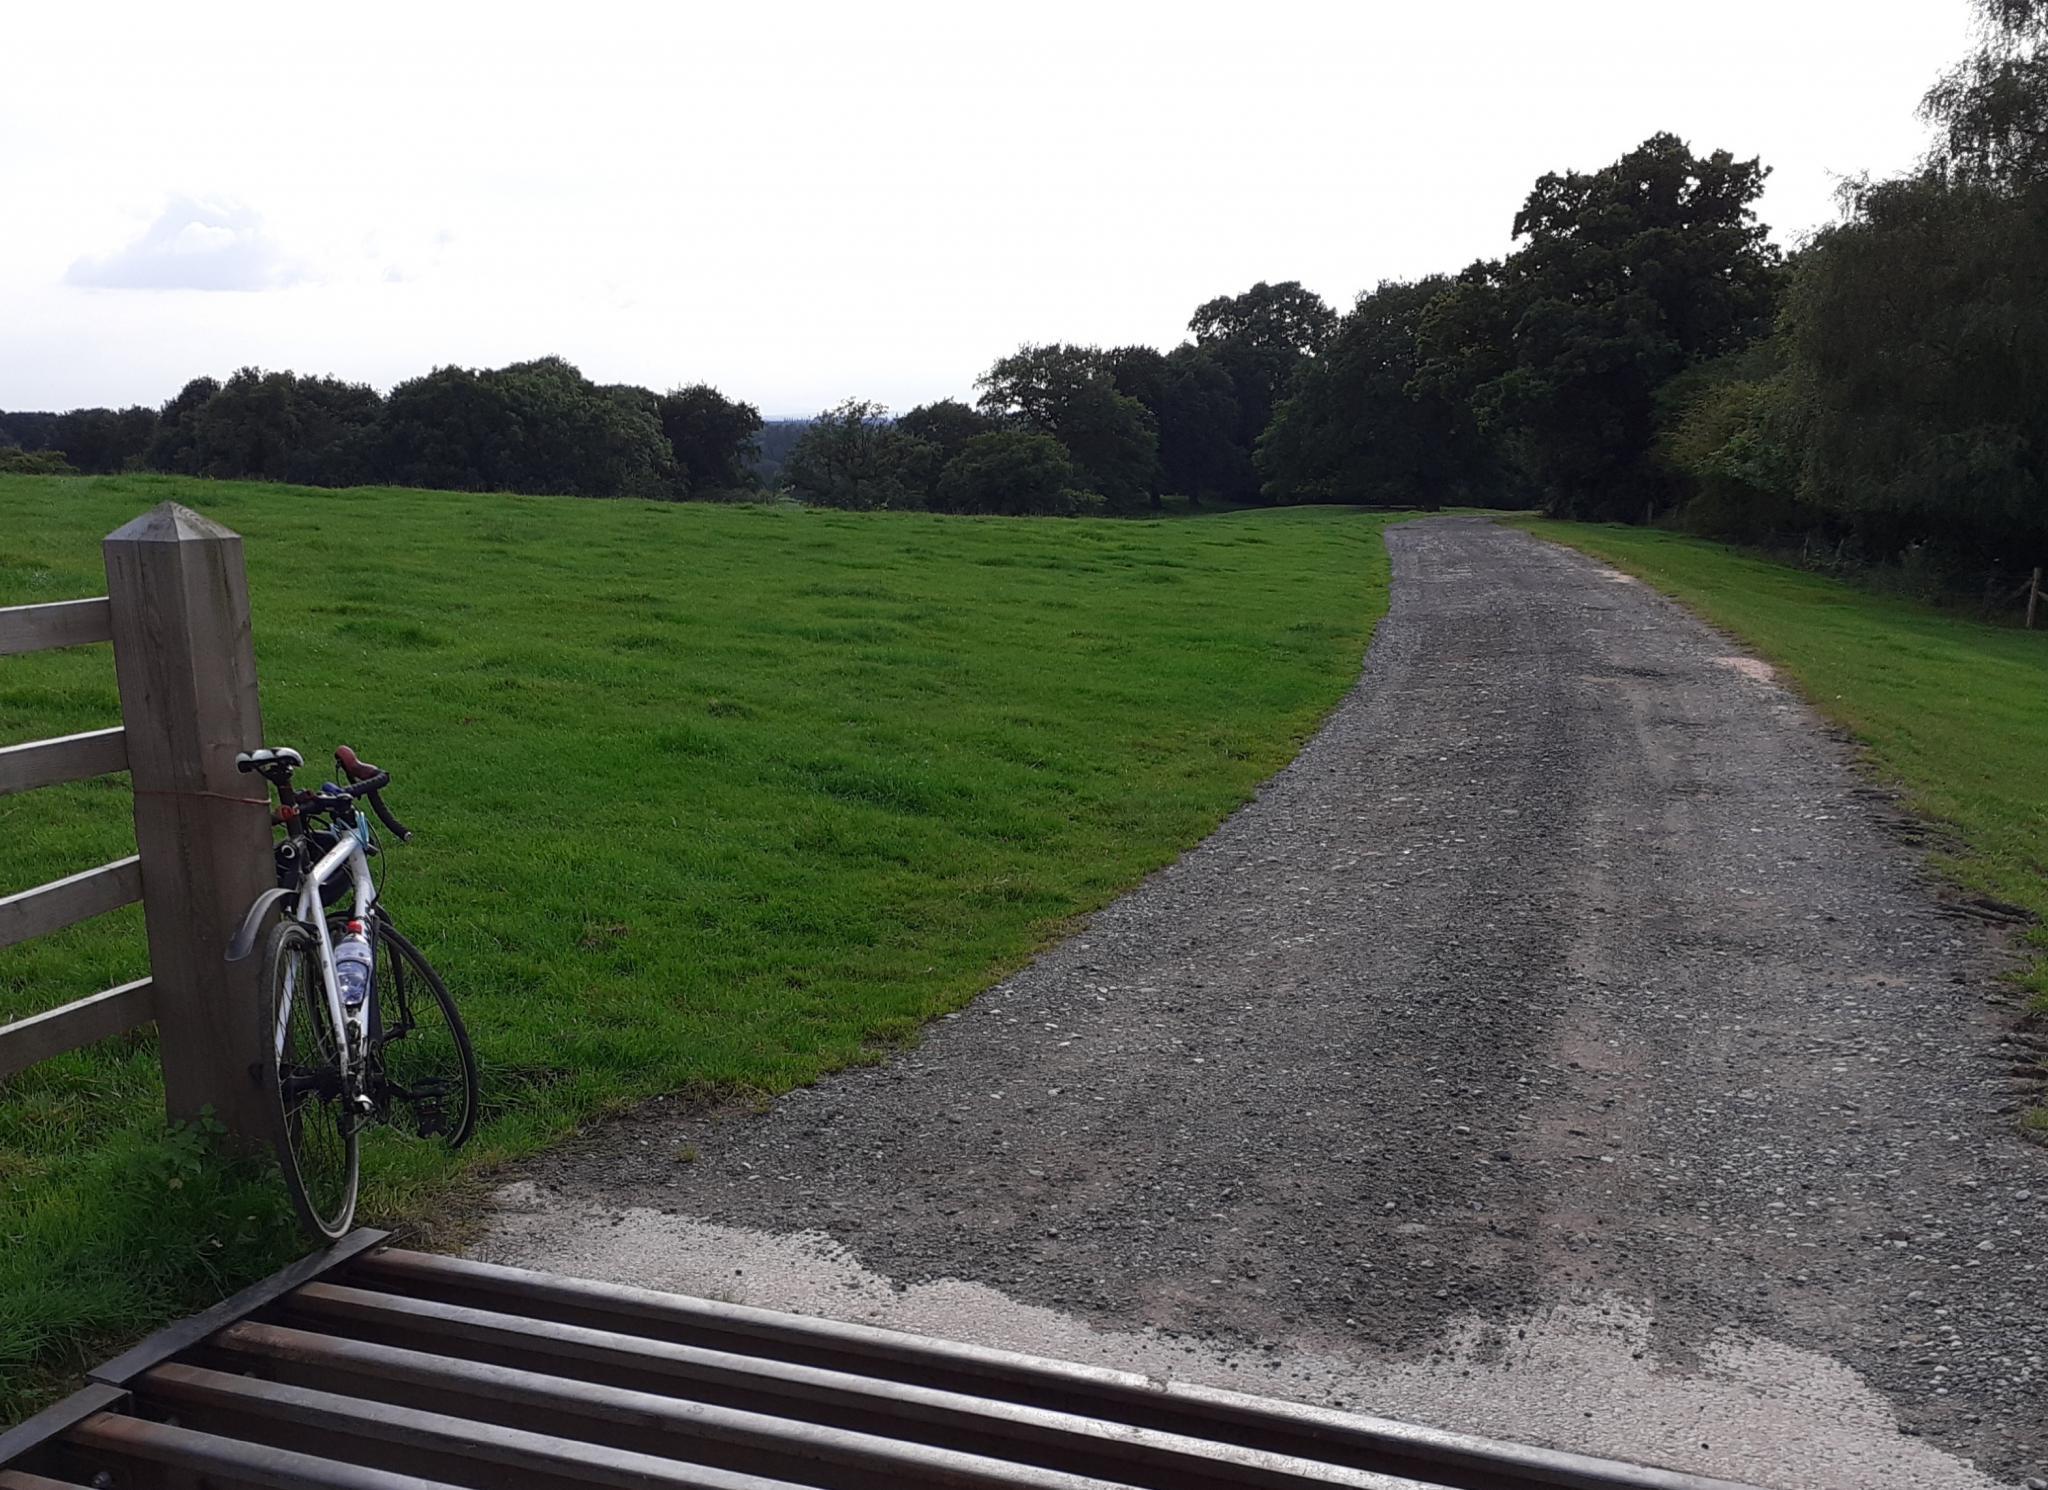 On my bike-20210803_143441-jpg